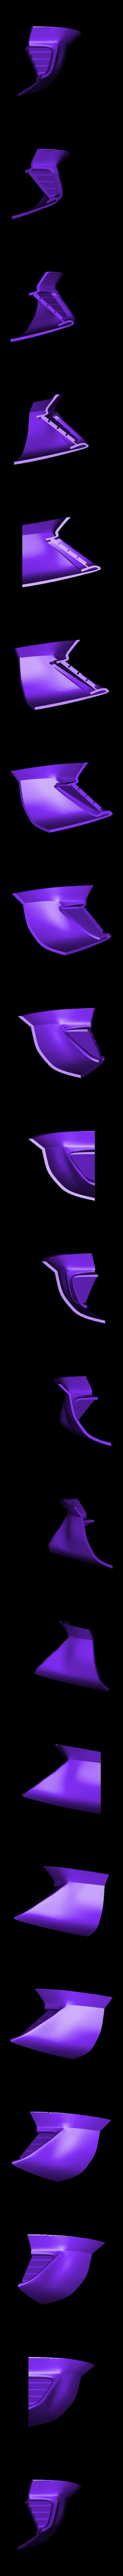 Part 15 v1.stl Download STL file ARF Trooper Helmet • 3D print object, VillainousPropShop